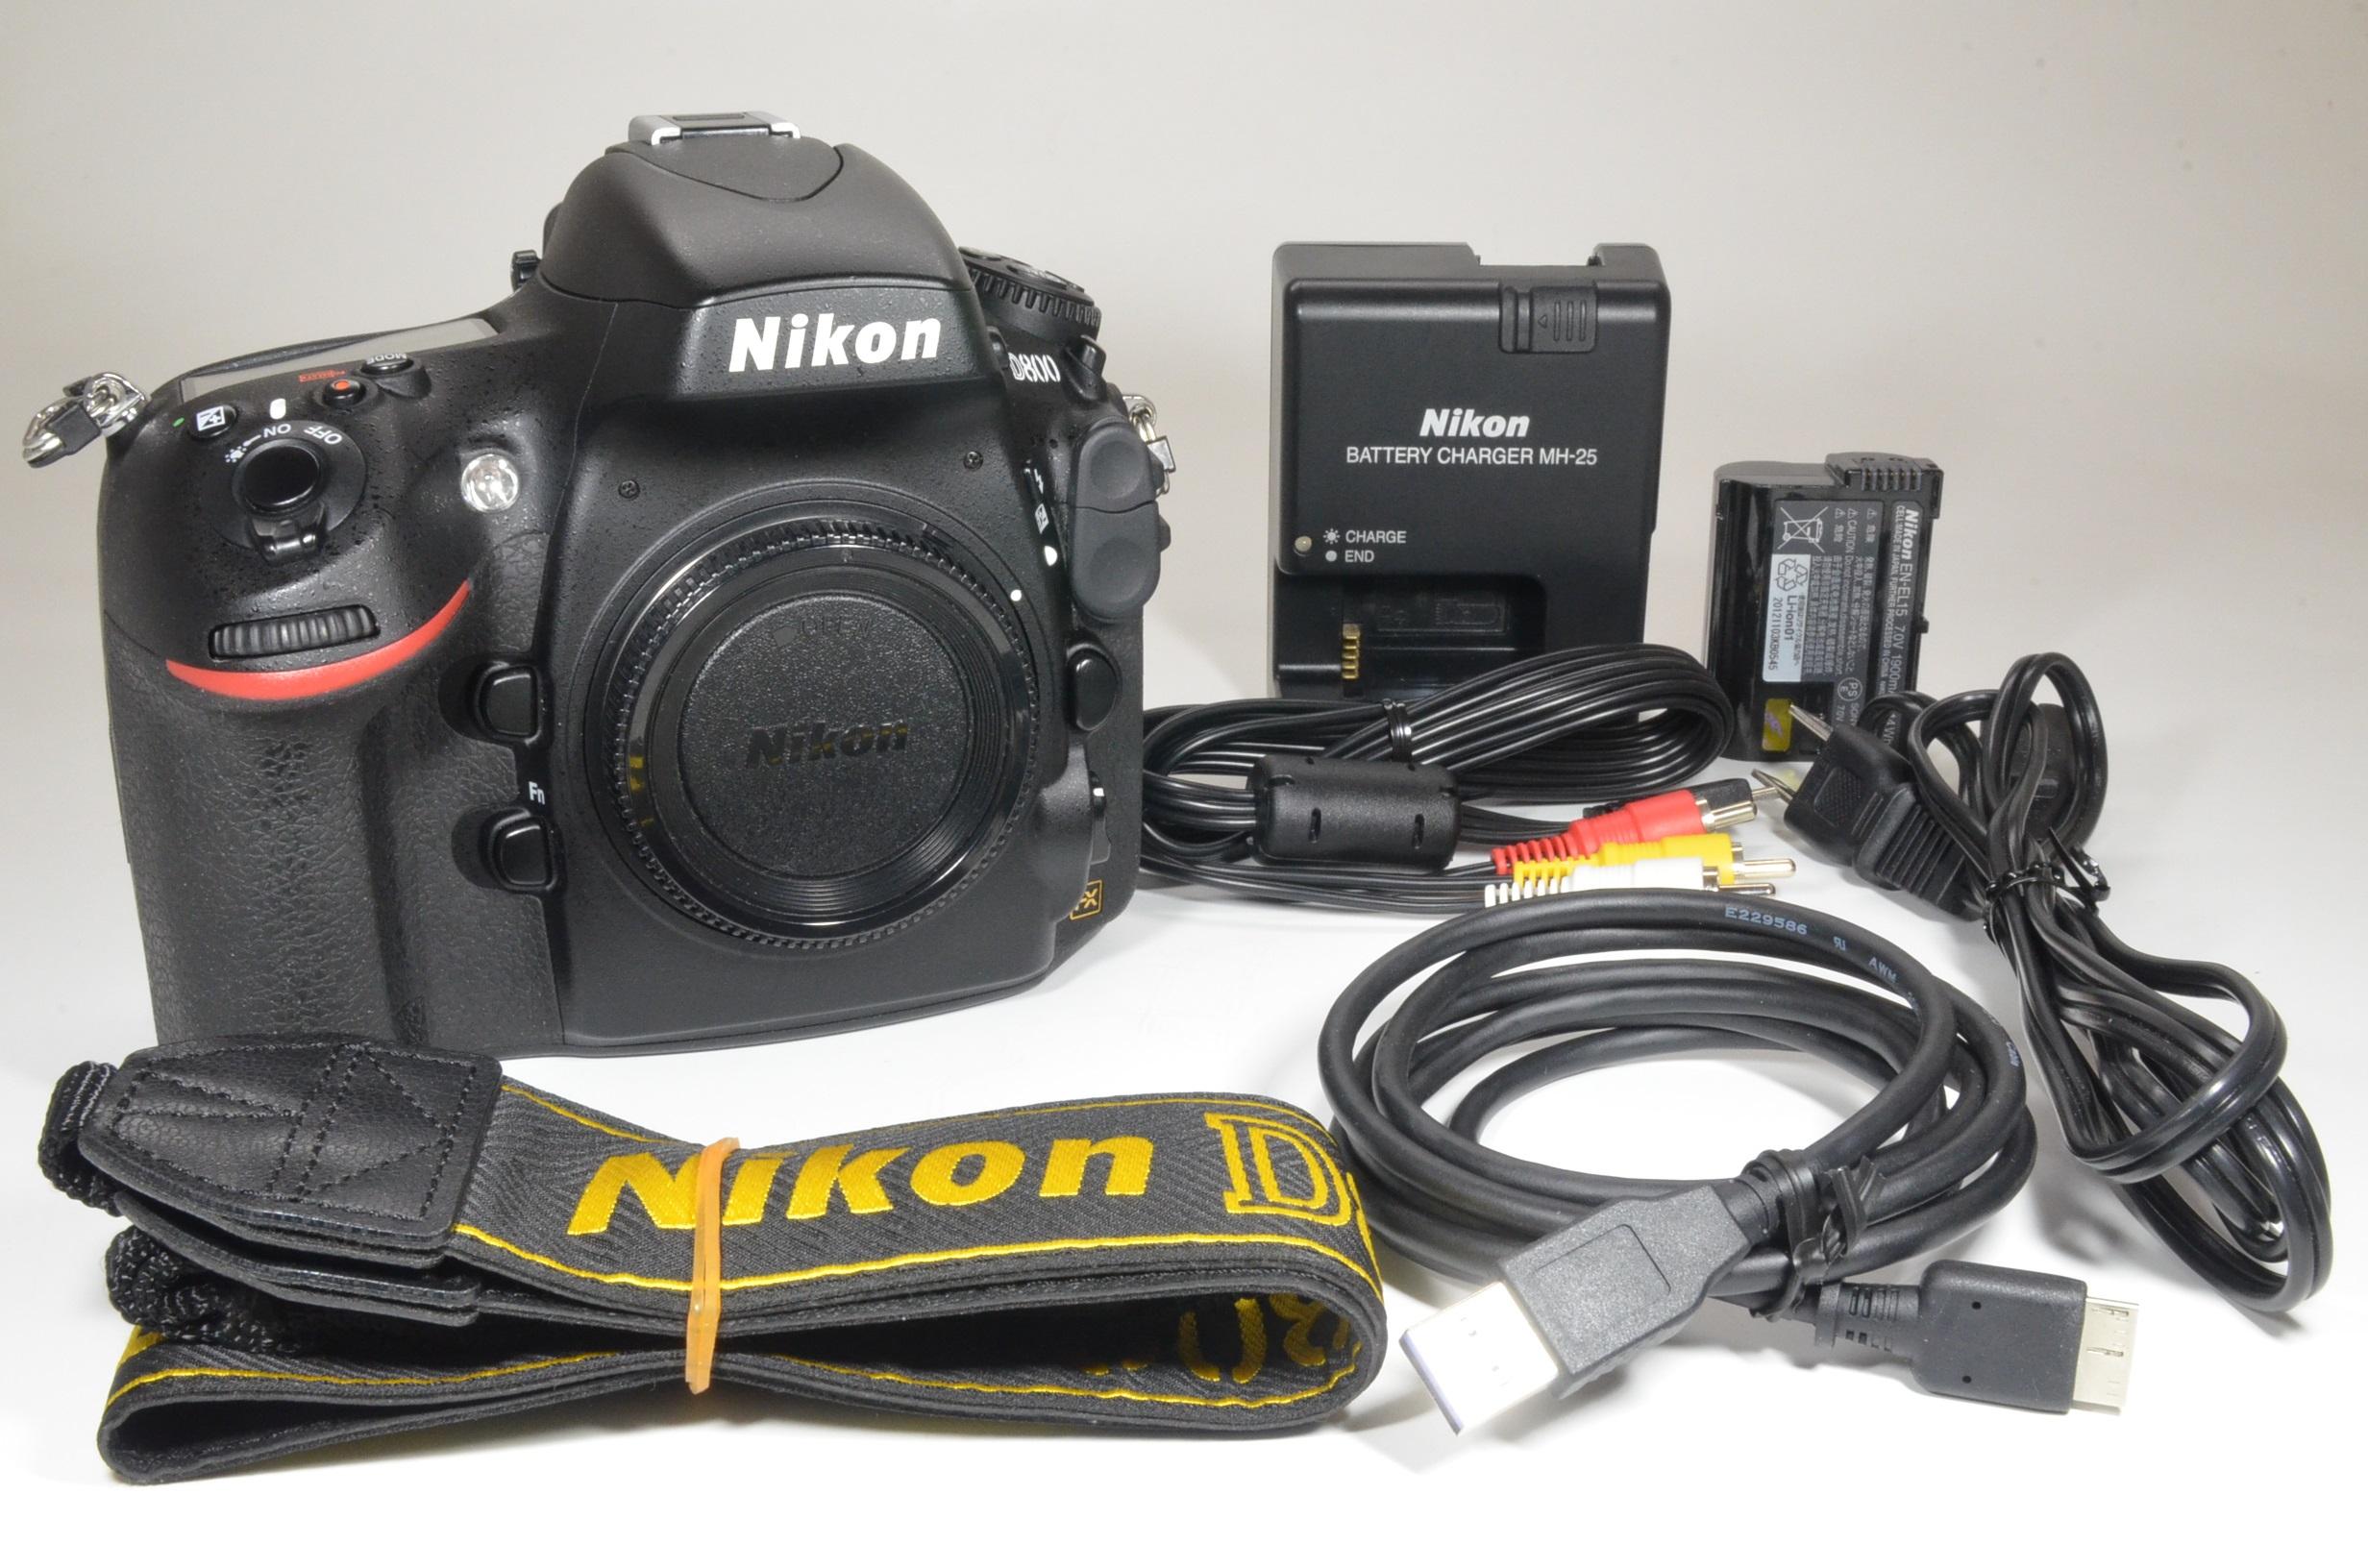 nikon d800 36.3mp digital slr camera body shutter count 9040